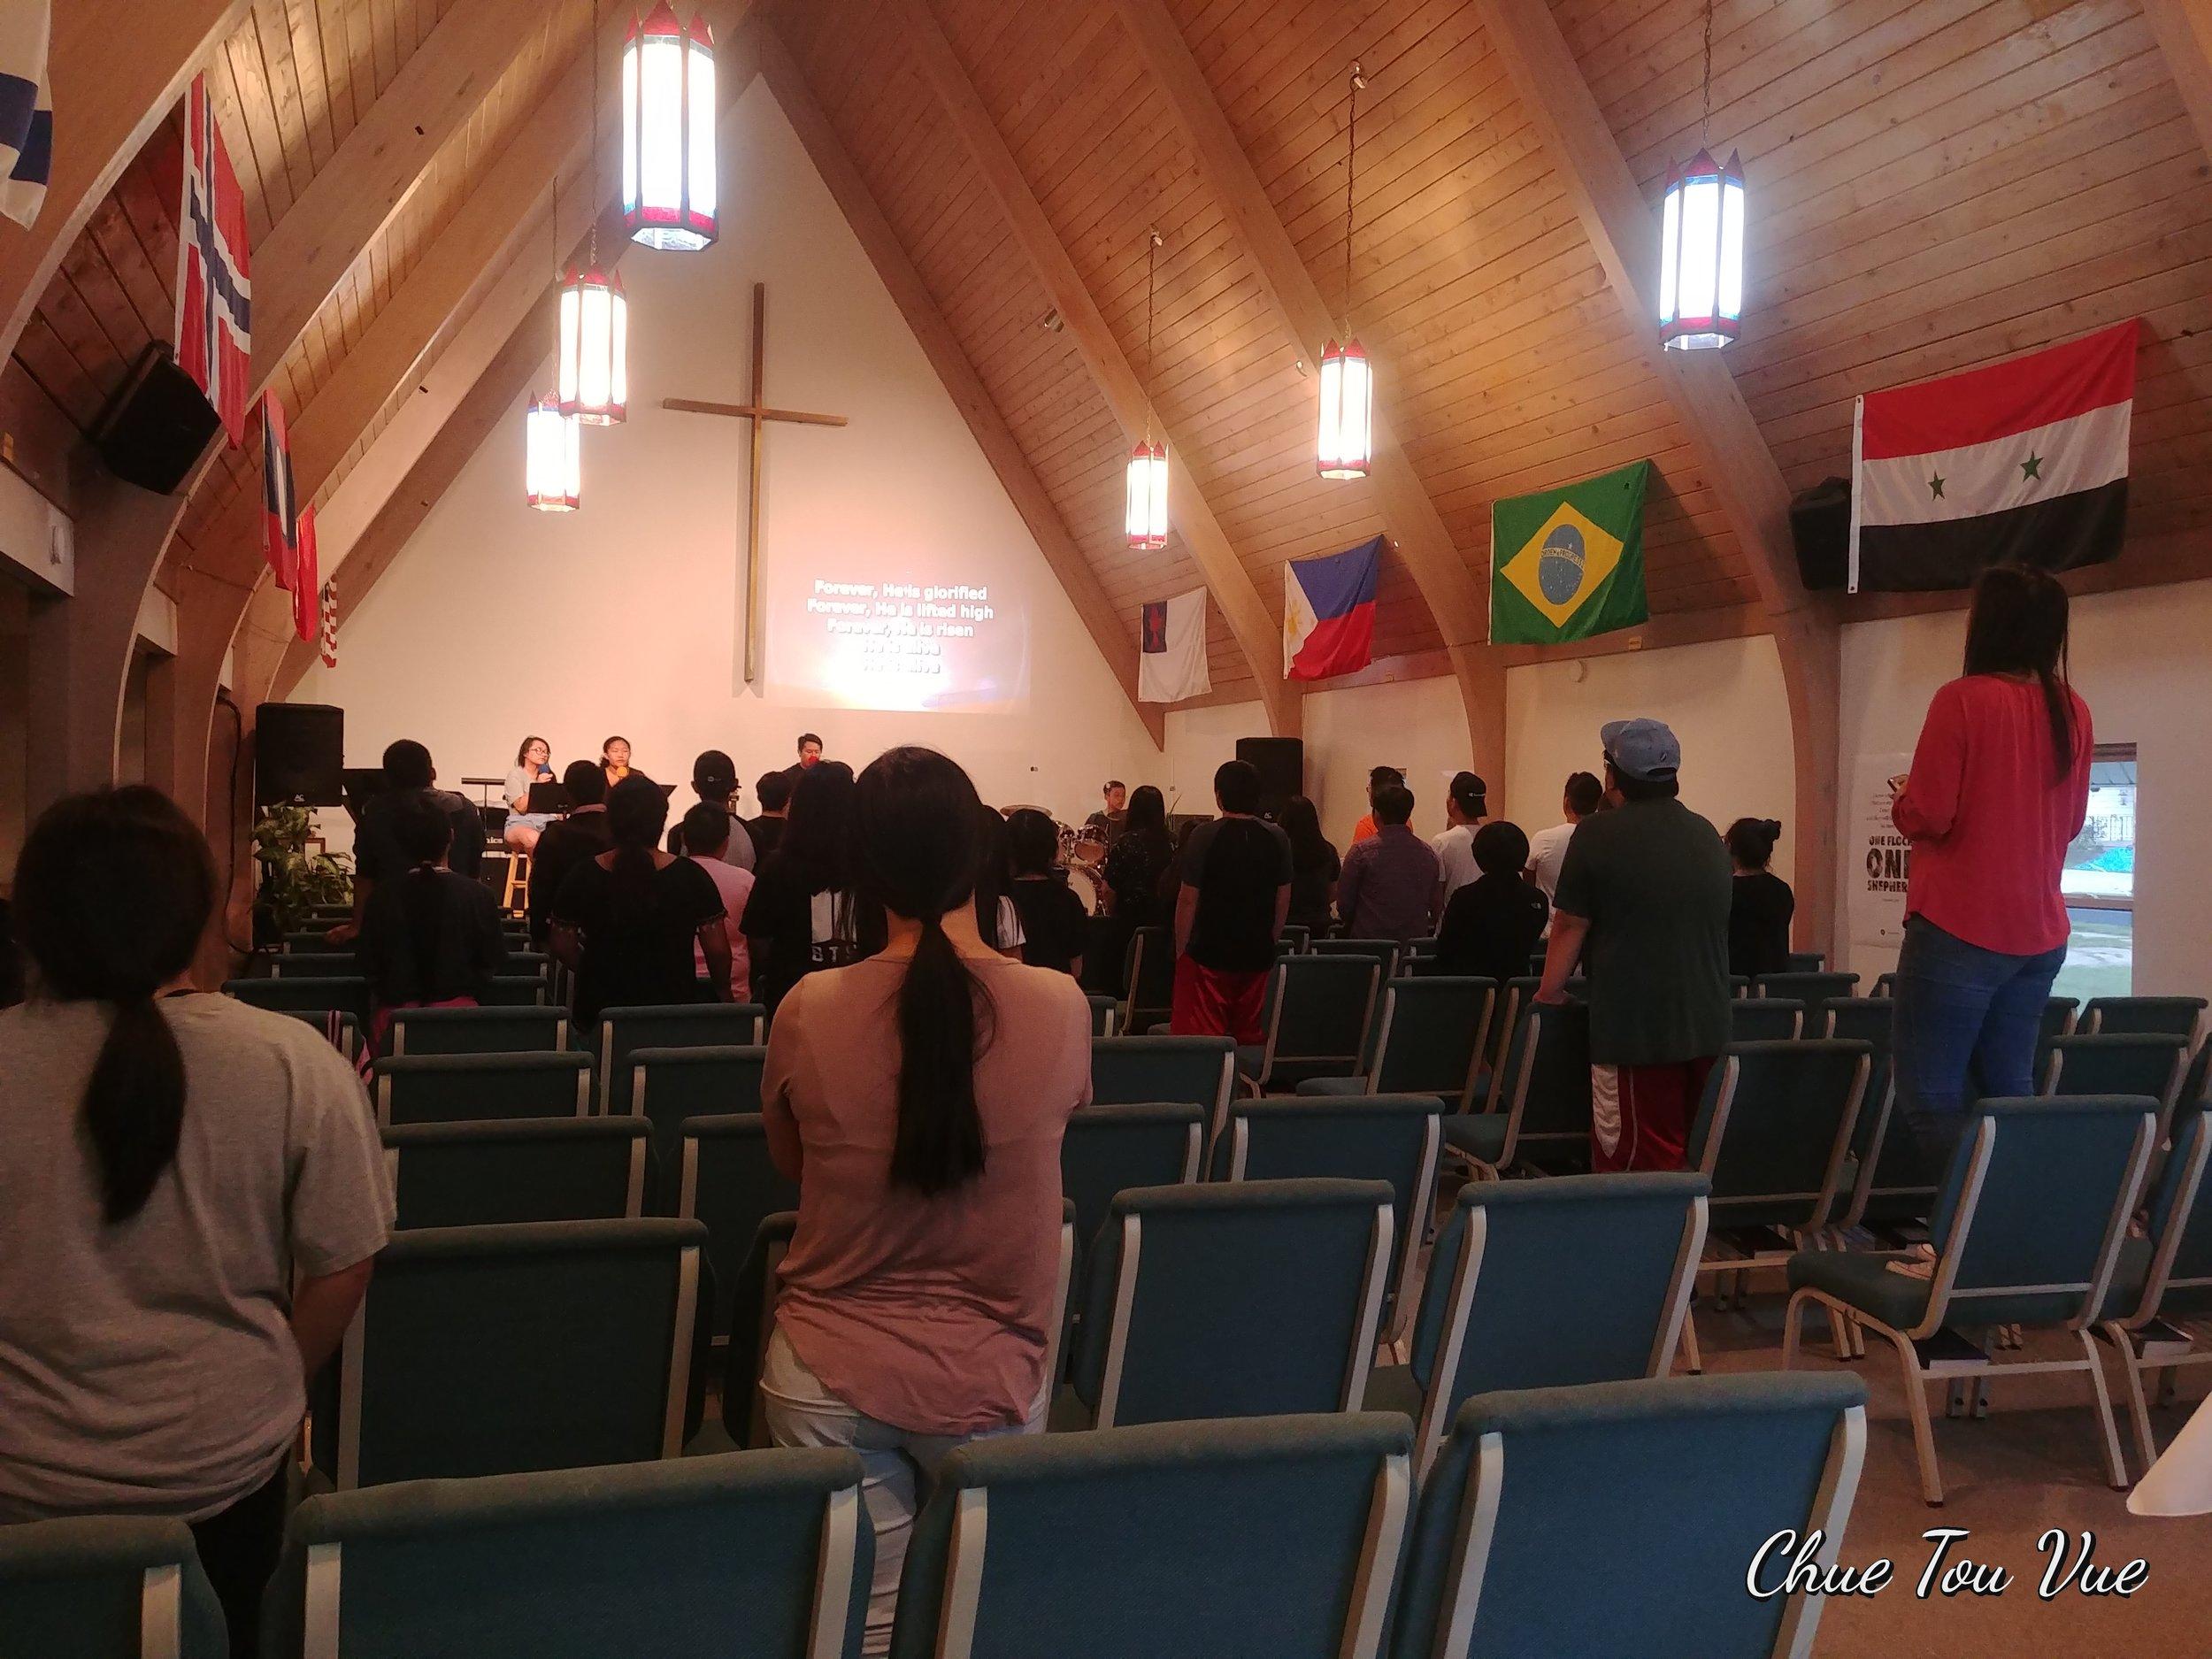 Singing together to glorify God